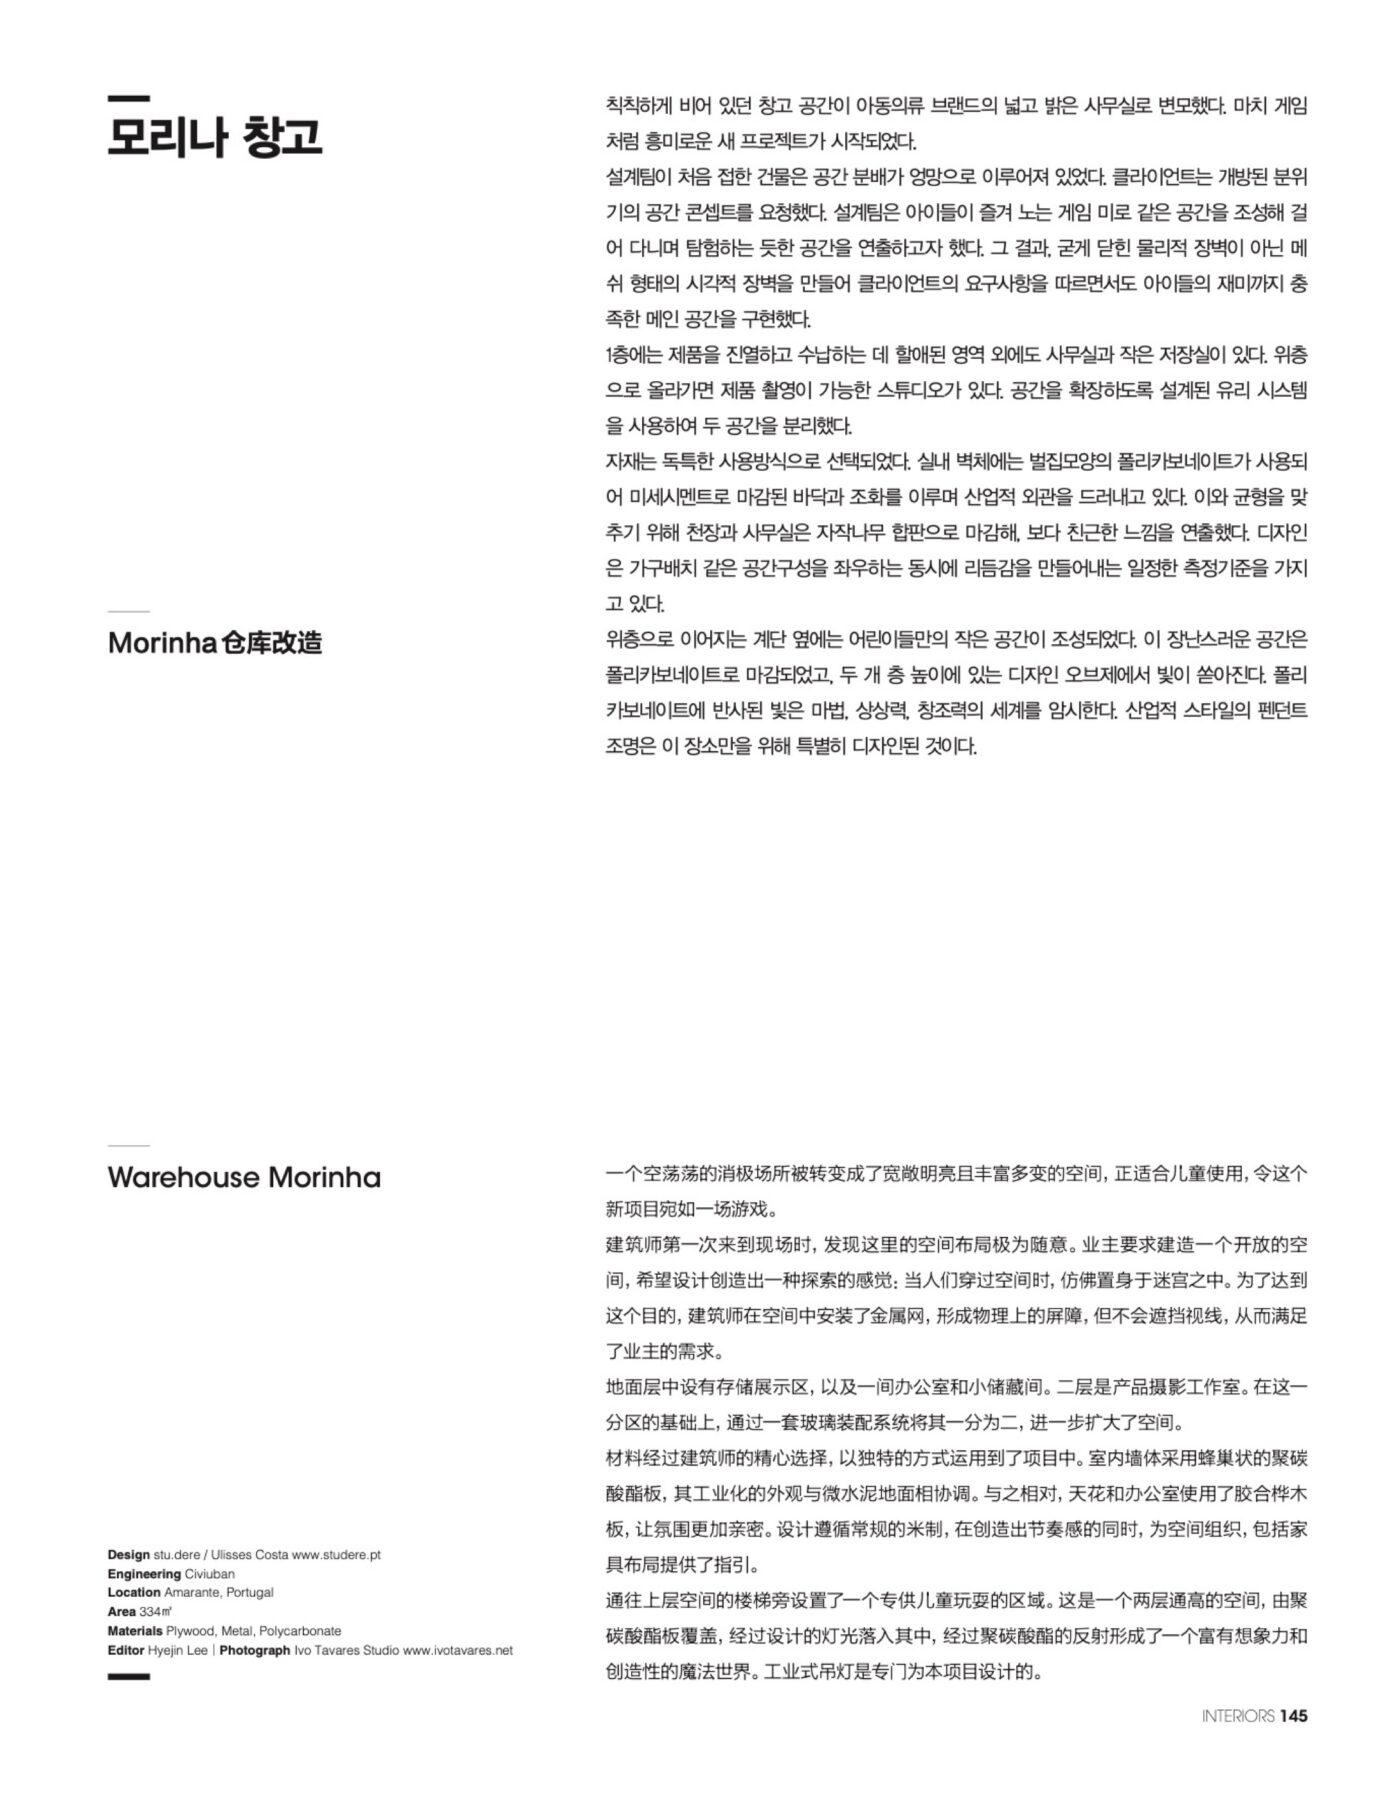 interiors korea studere aramazens morinha 413 2 2